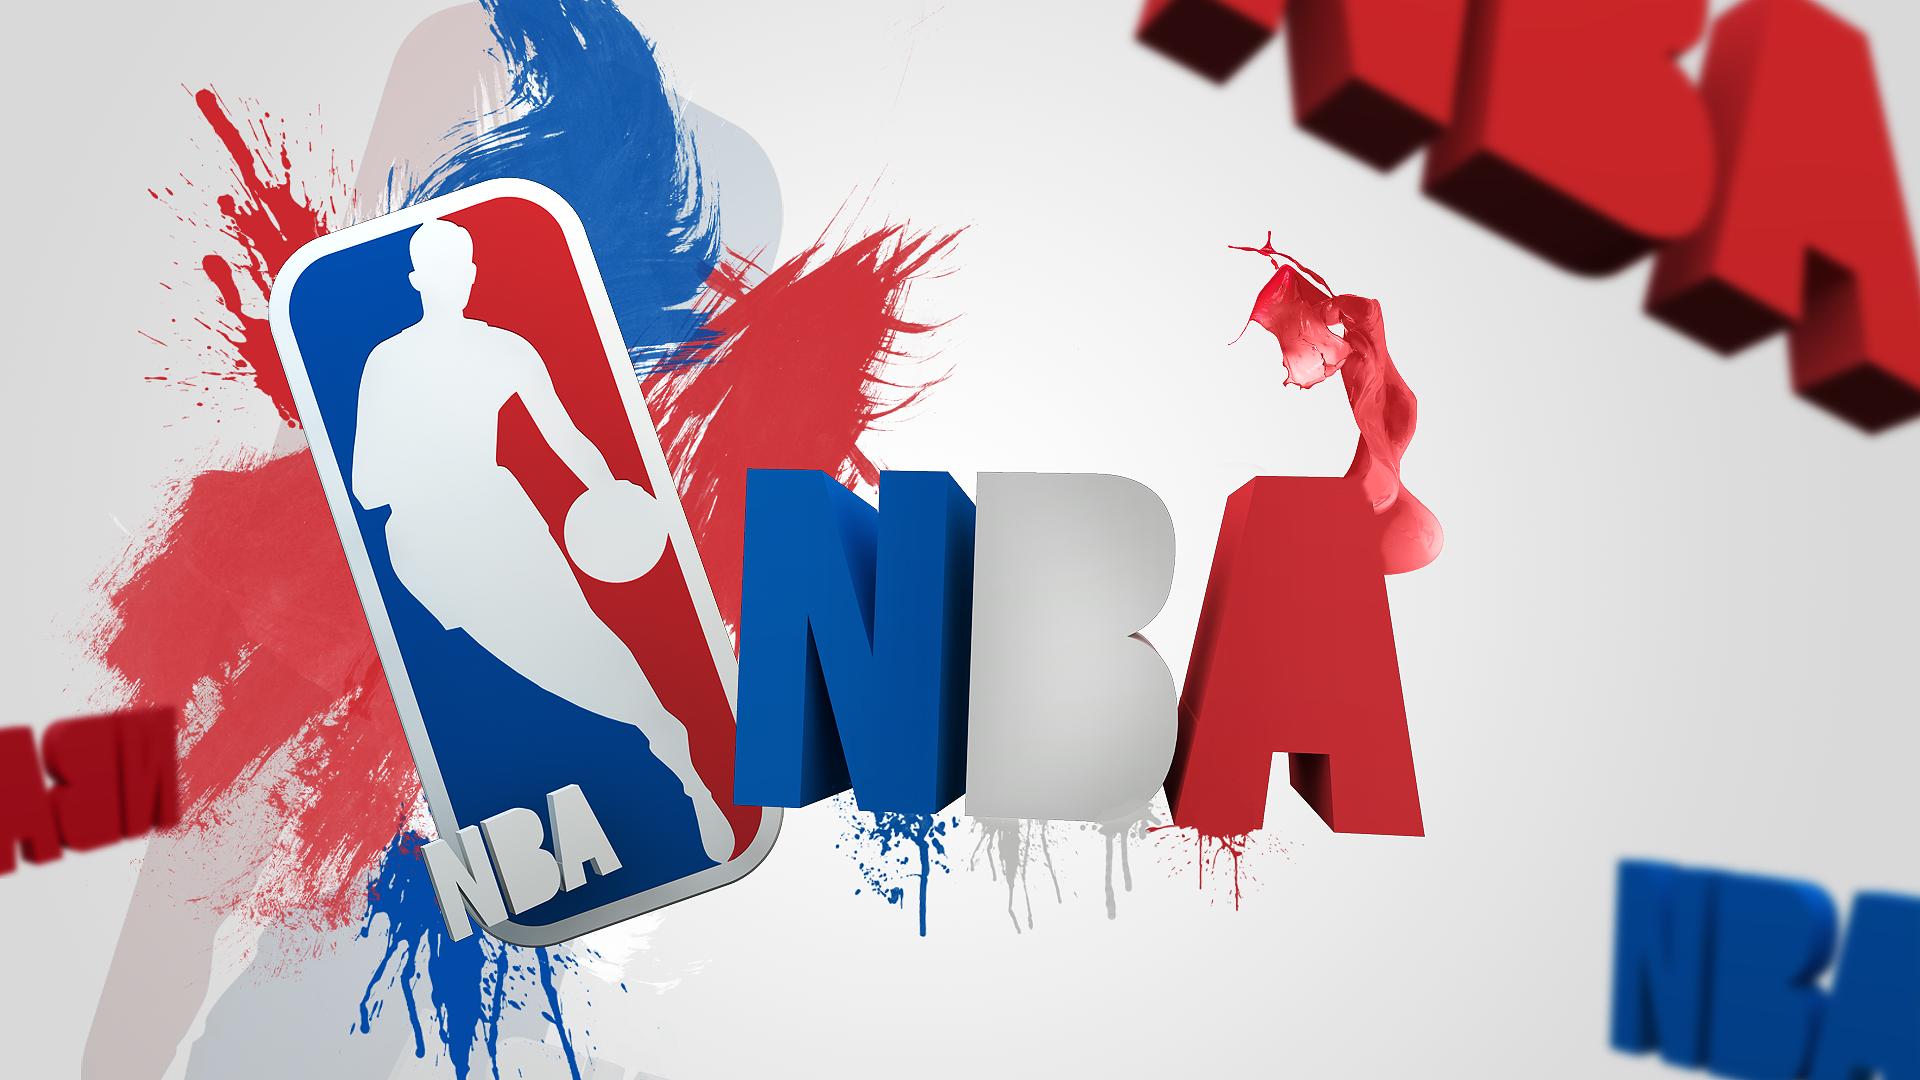 Fond D écran Basketball Nba 1920x1080 Nightelf87